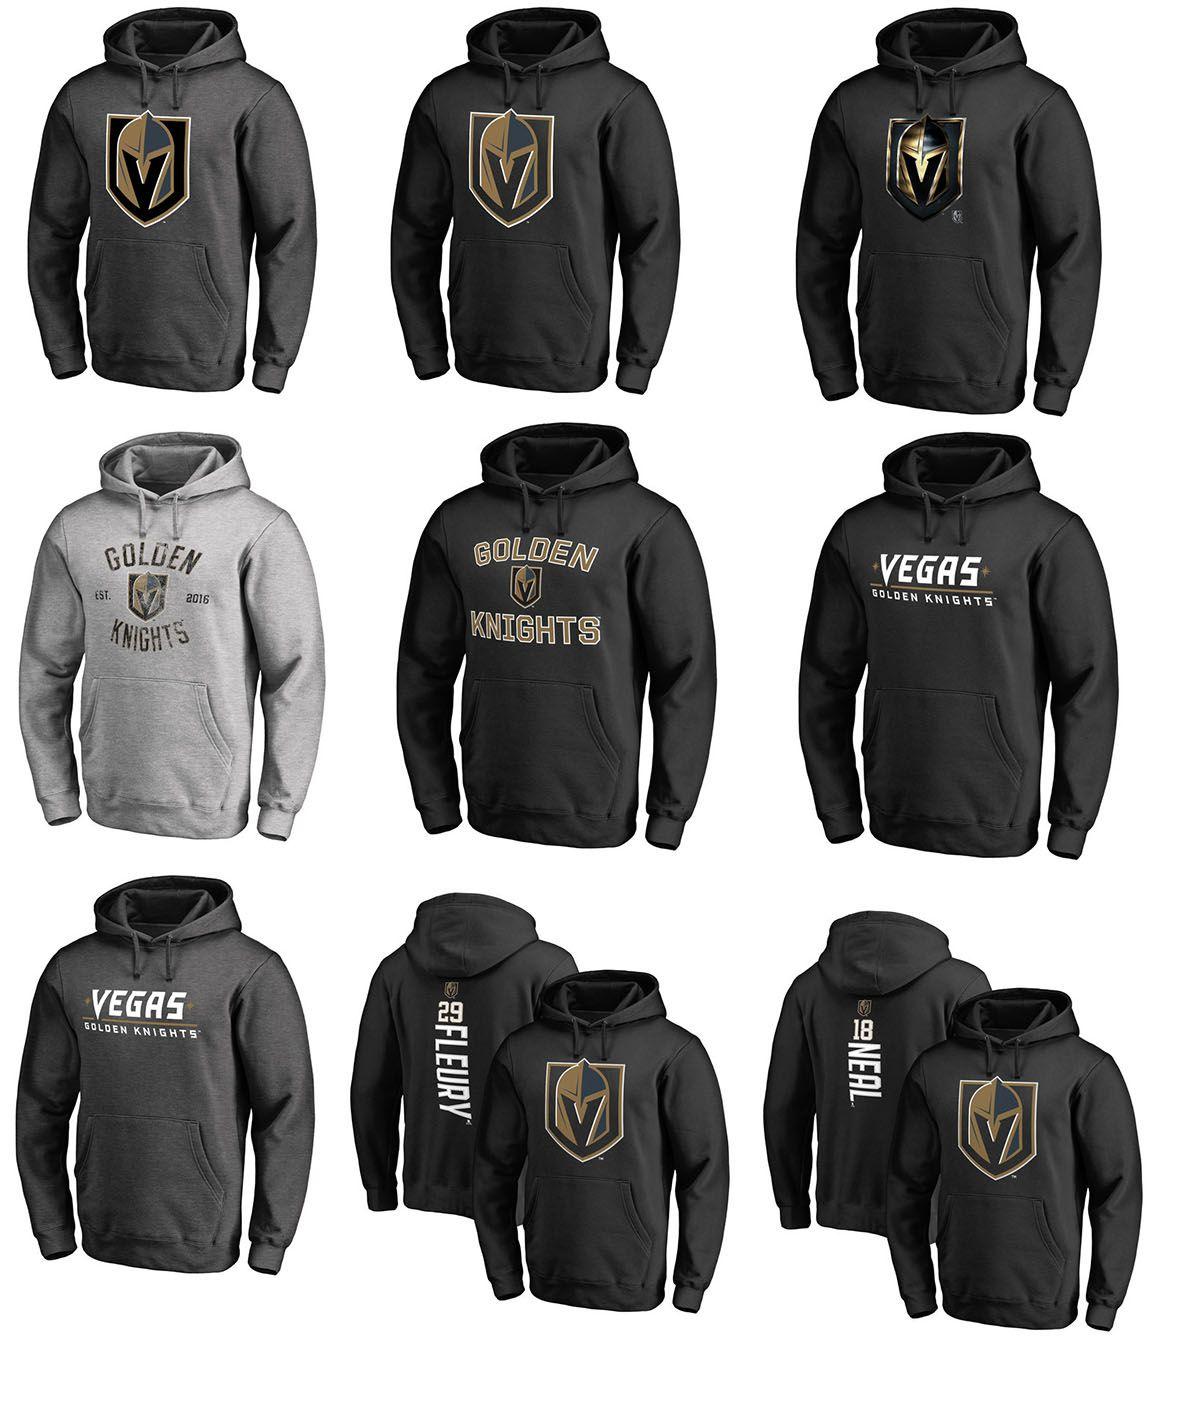 low priced f2dfa 4fd40 NHL Vegas Golden Knights hoodies 29 Marc-Andre 18 James Neal 71 William  Karlsson Deryk Engelland David Perron hockey hoodie sweatshirts